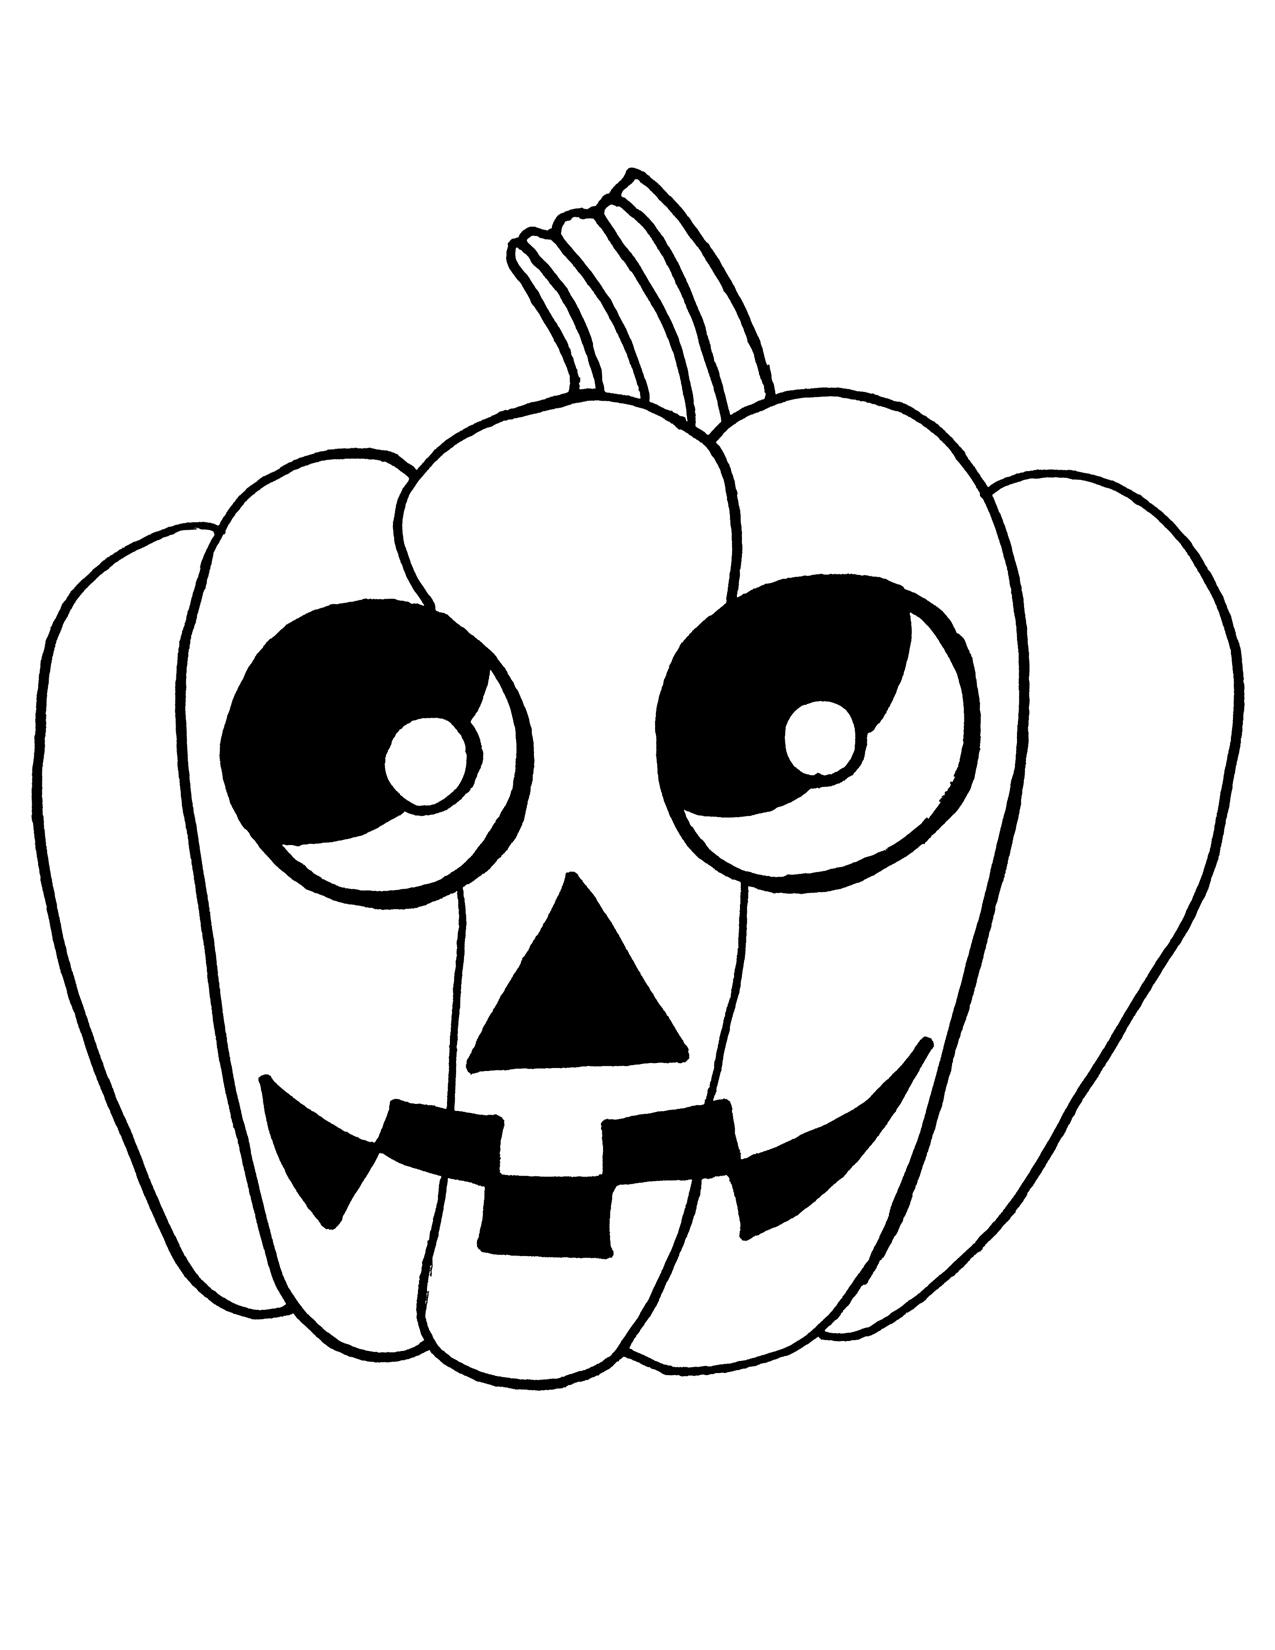 Line Art Halloween : Halloween line drawings clipart best